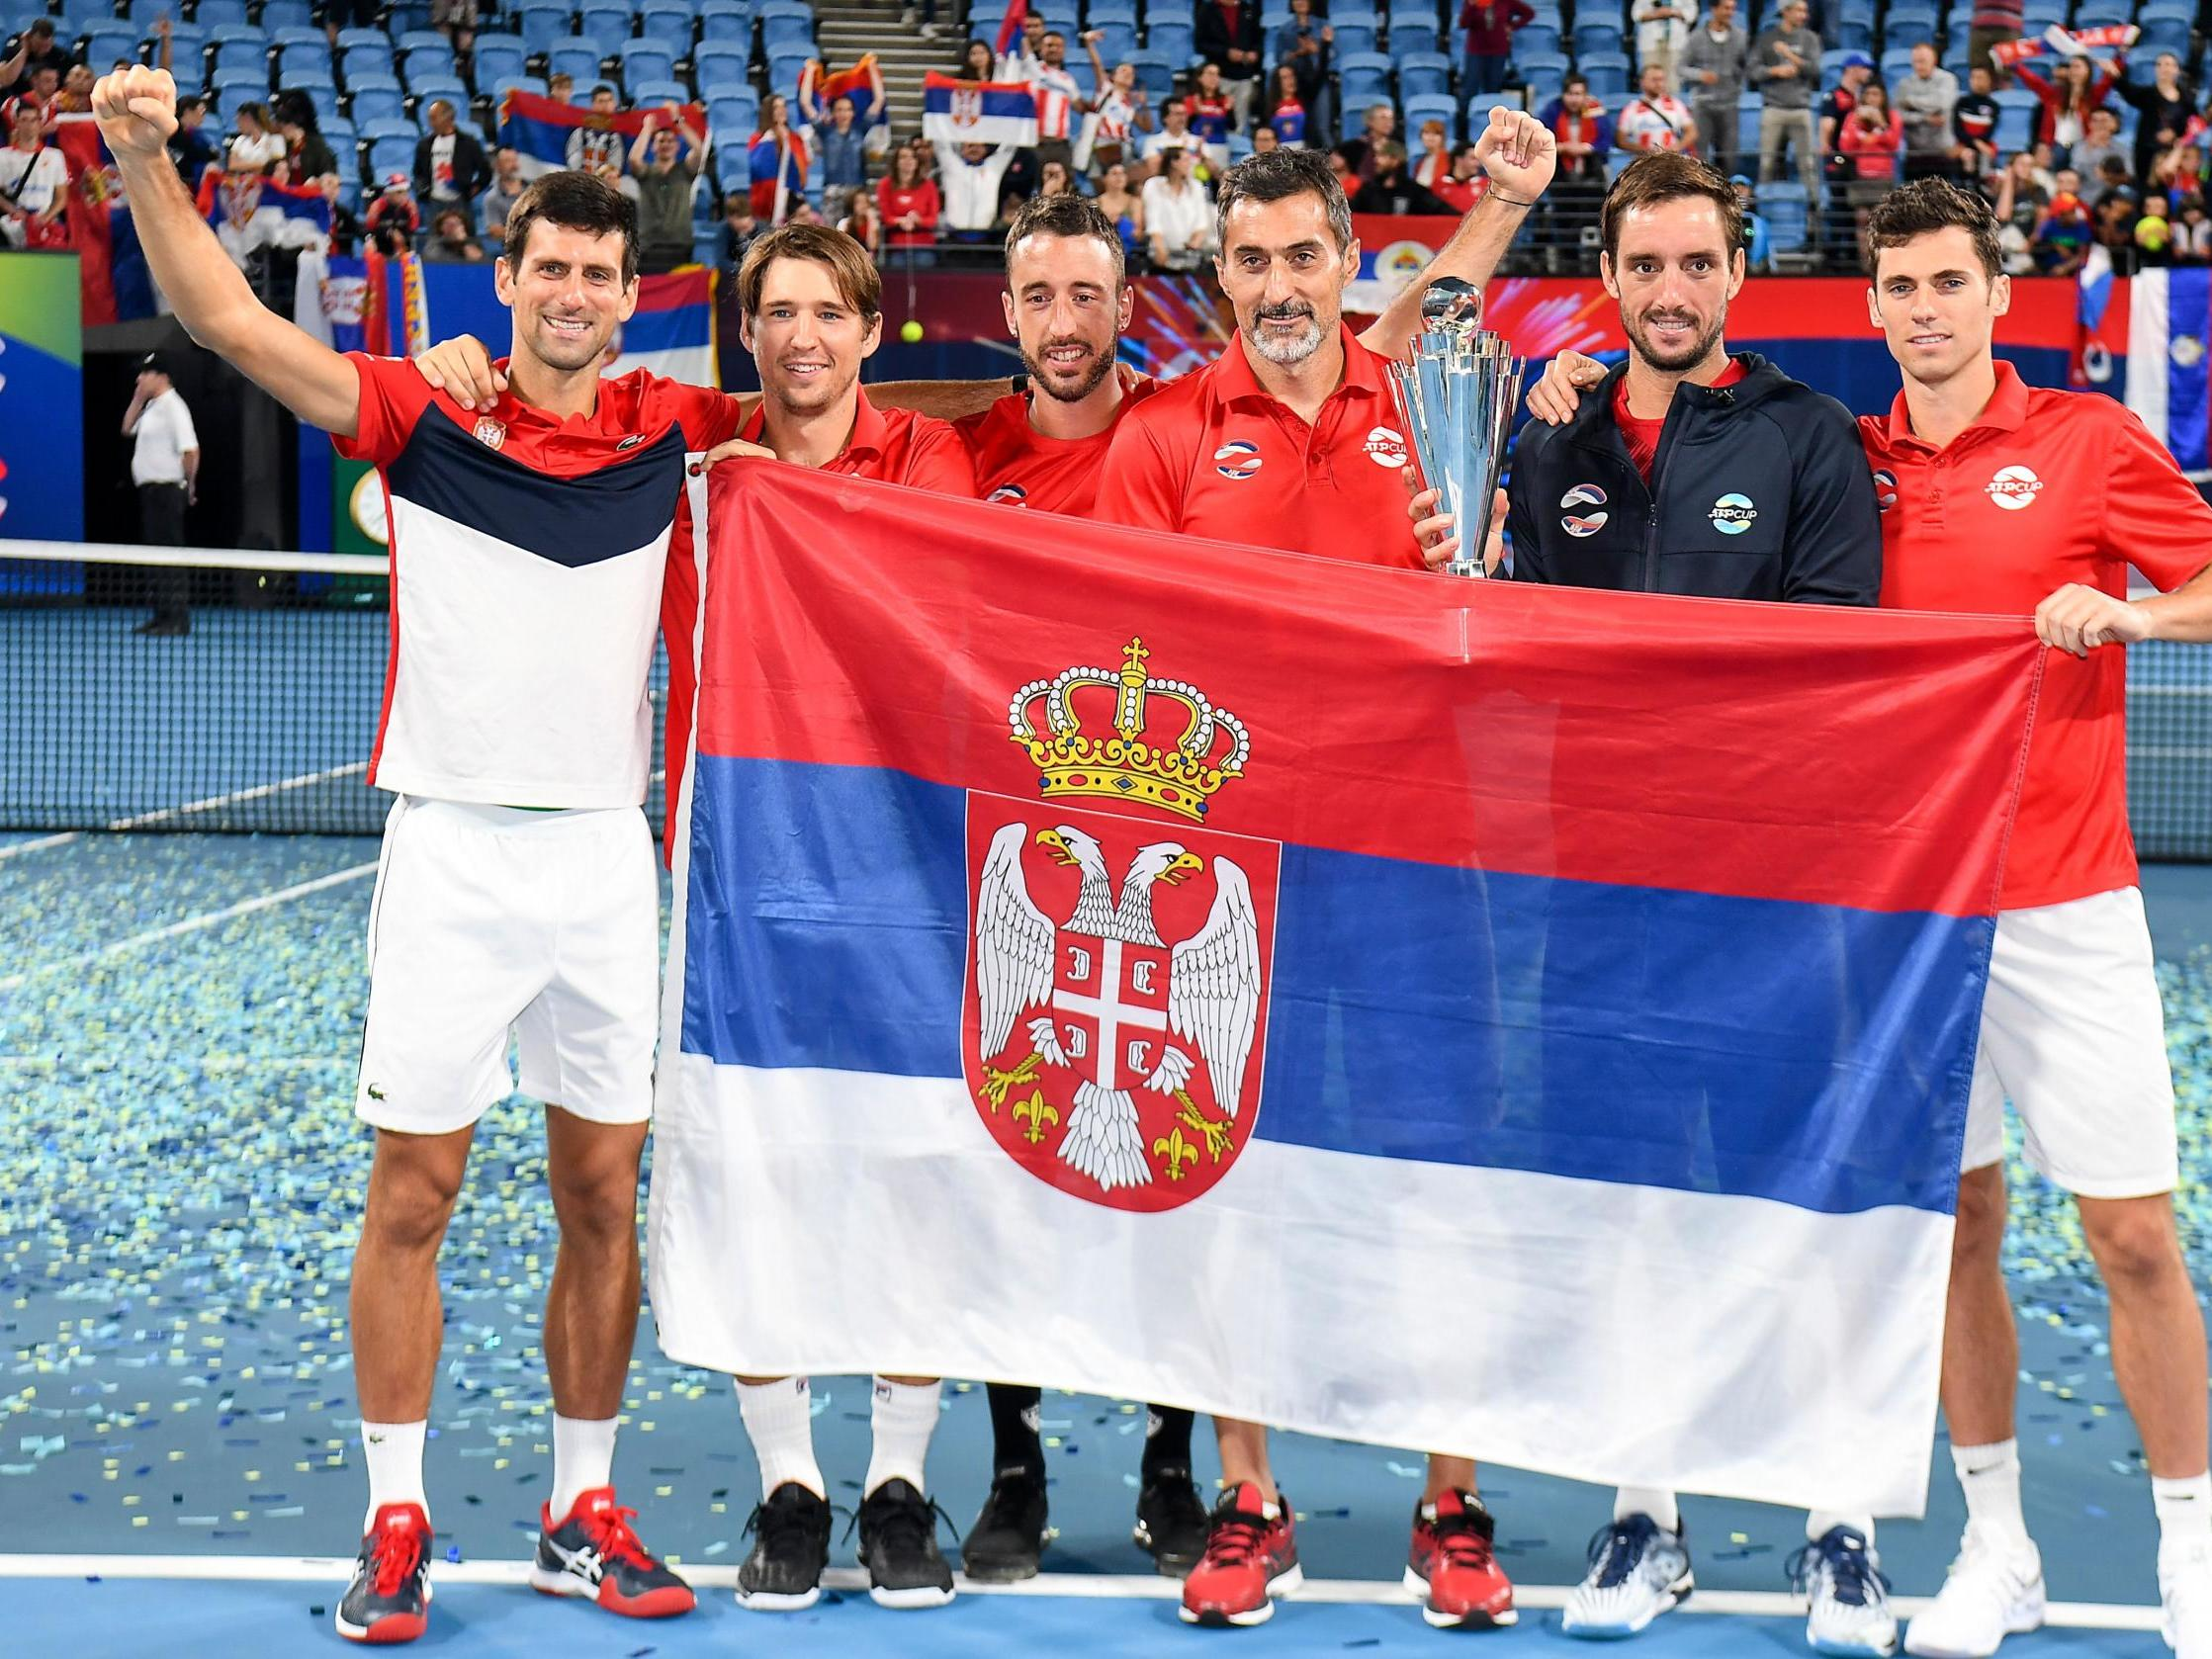 Rafael Nadal Flag Banner NEW Tennis Player Roland Garros Cup Champion